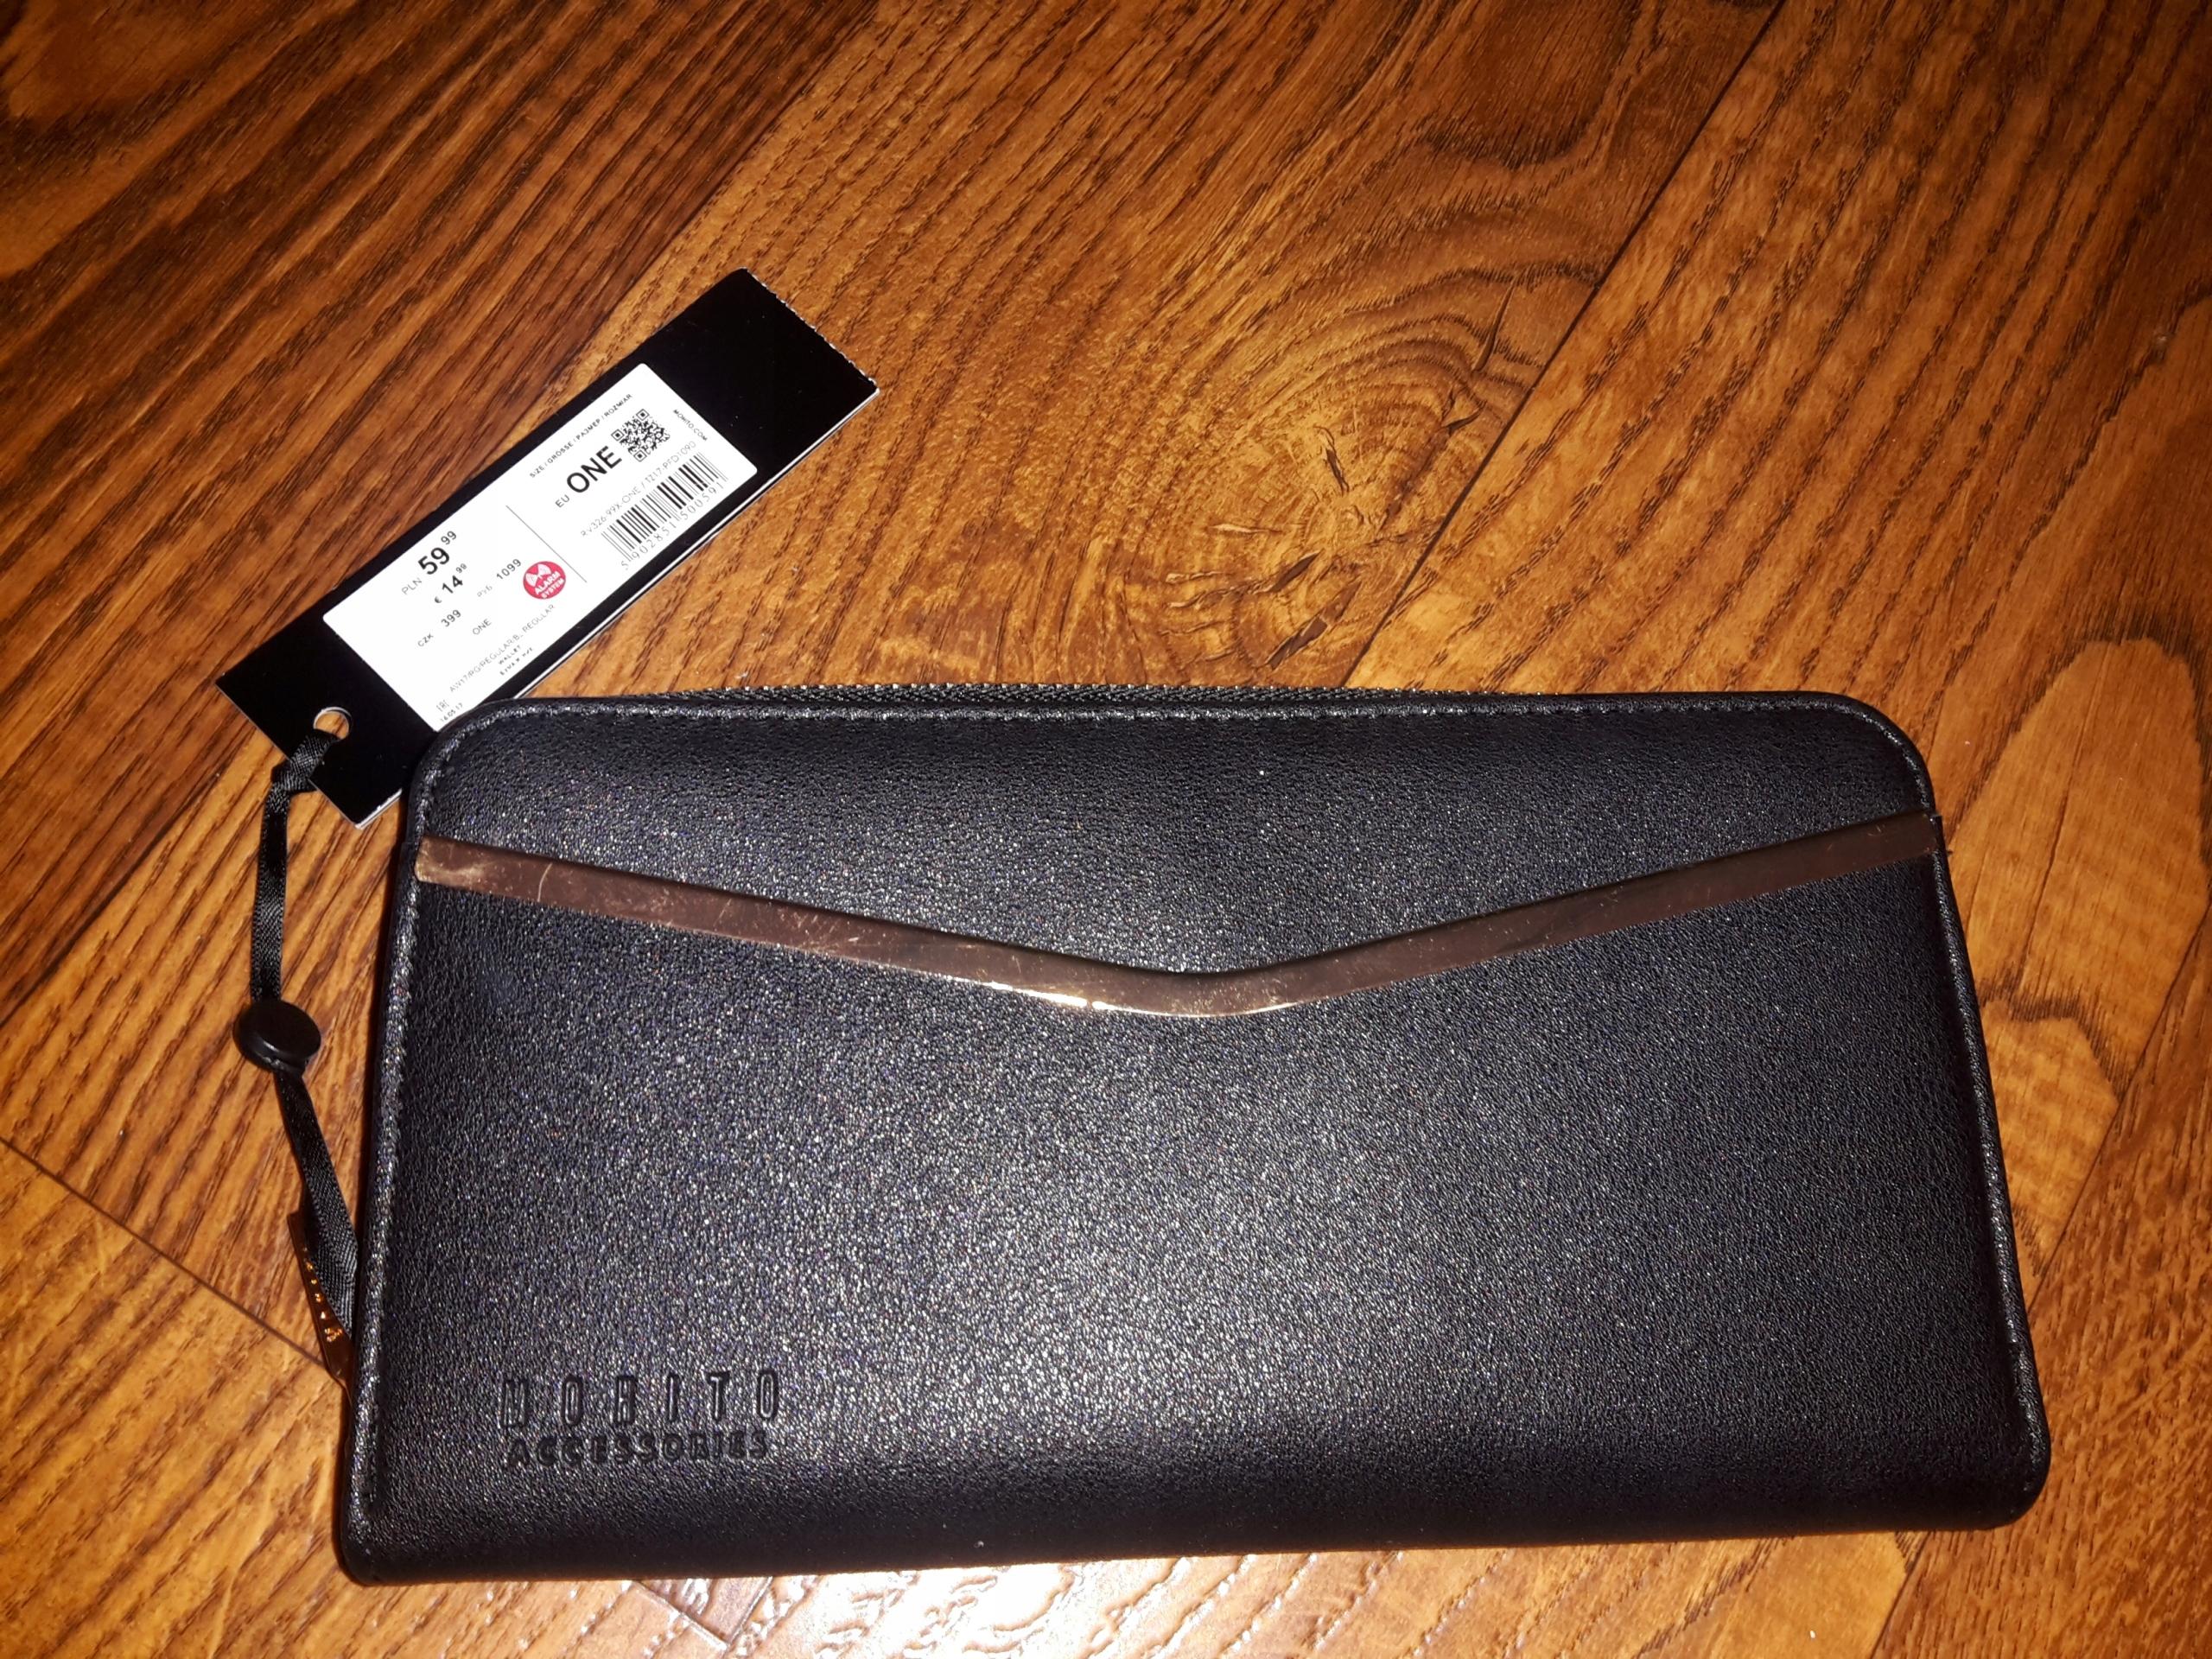 2cbec8db53e37 portfel MOHITO portmonetka czarny nowy 59zł okazja - 7552147901 ...